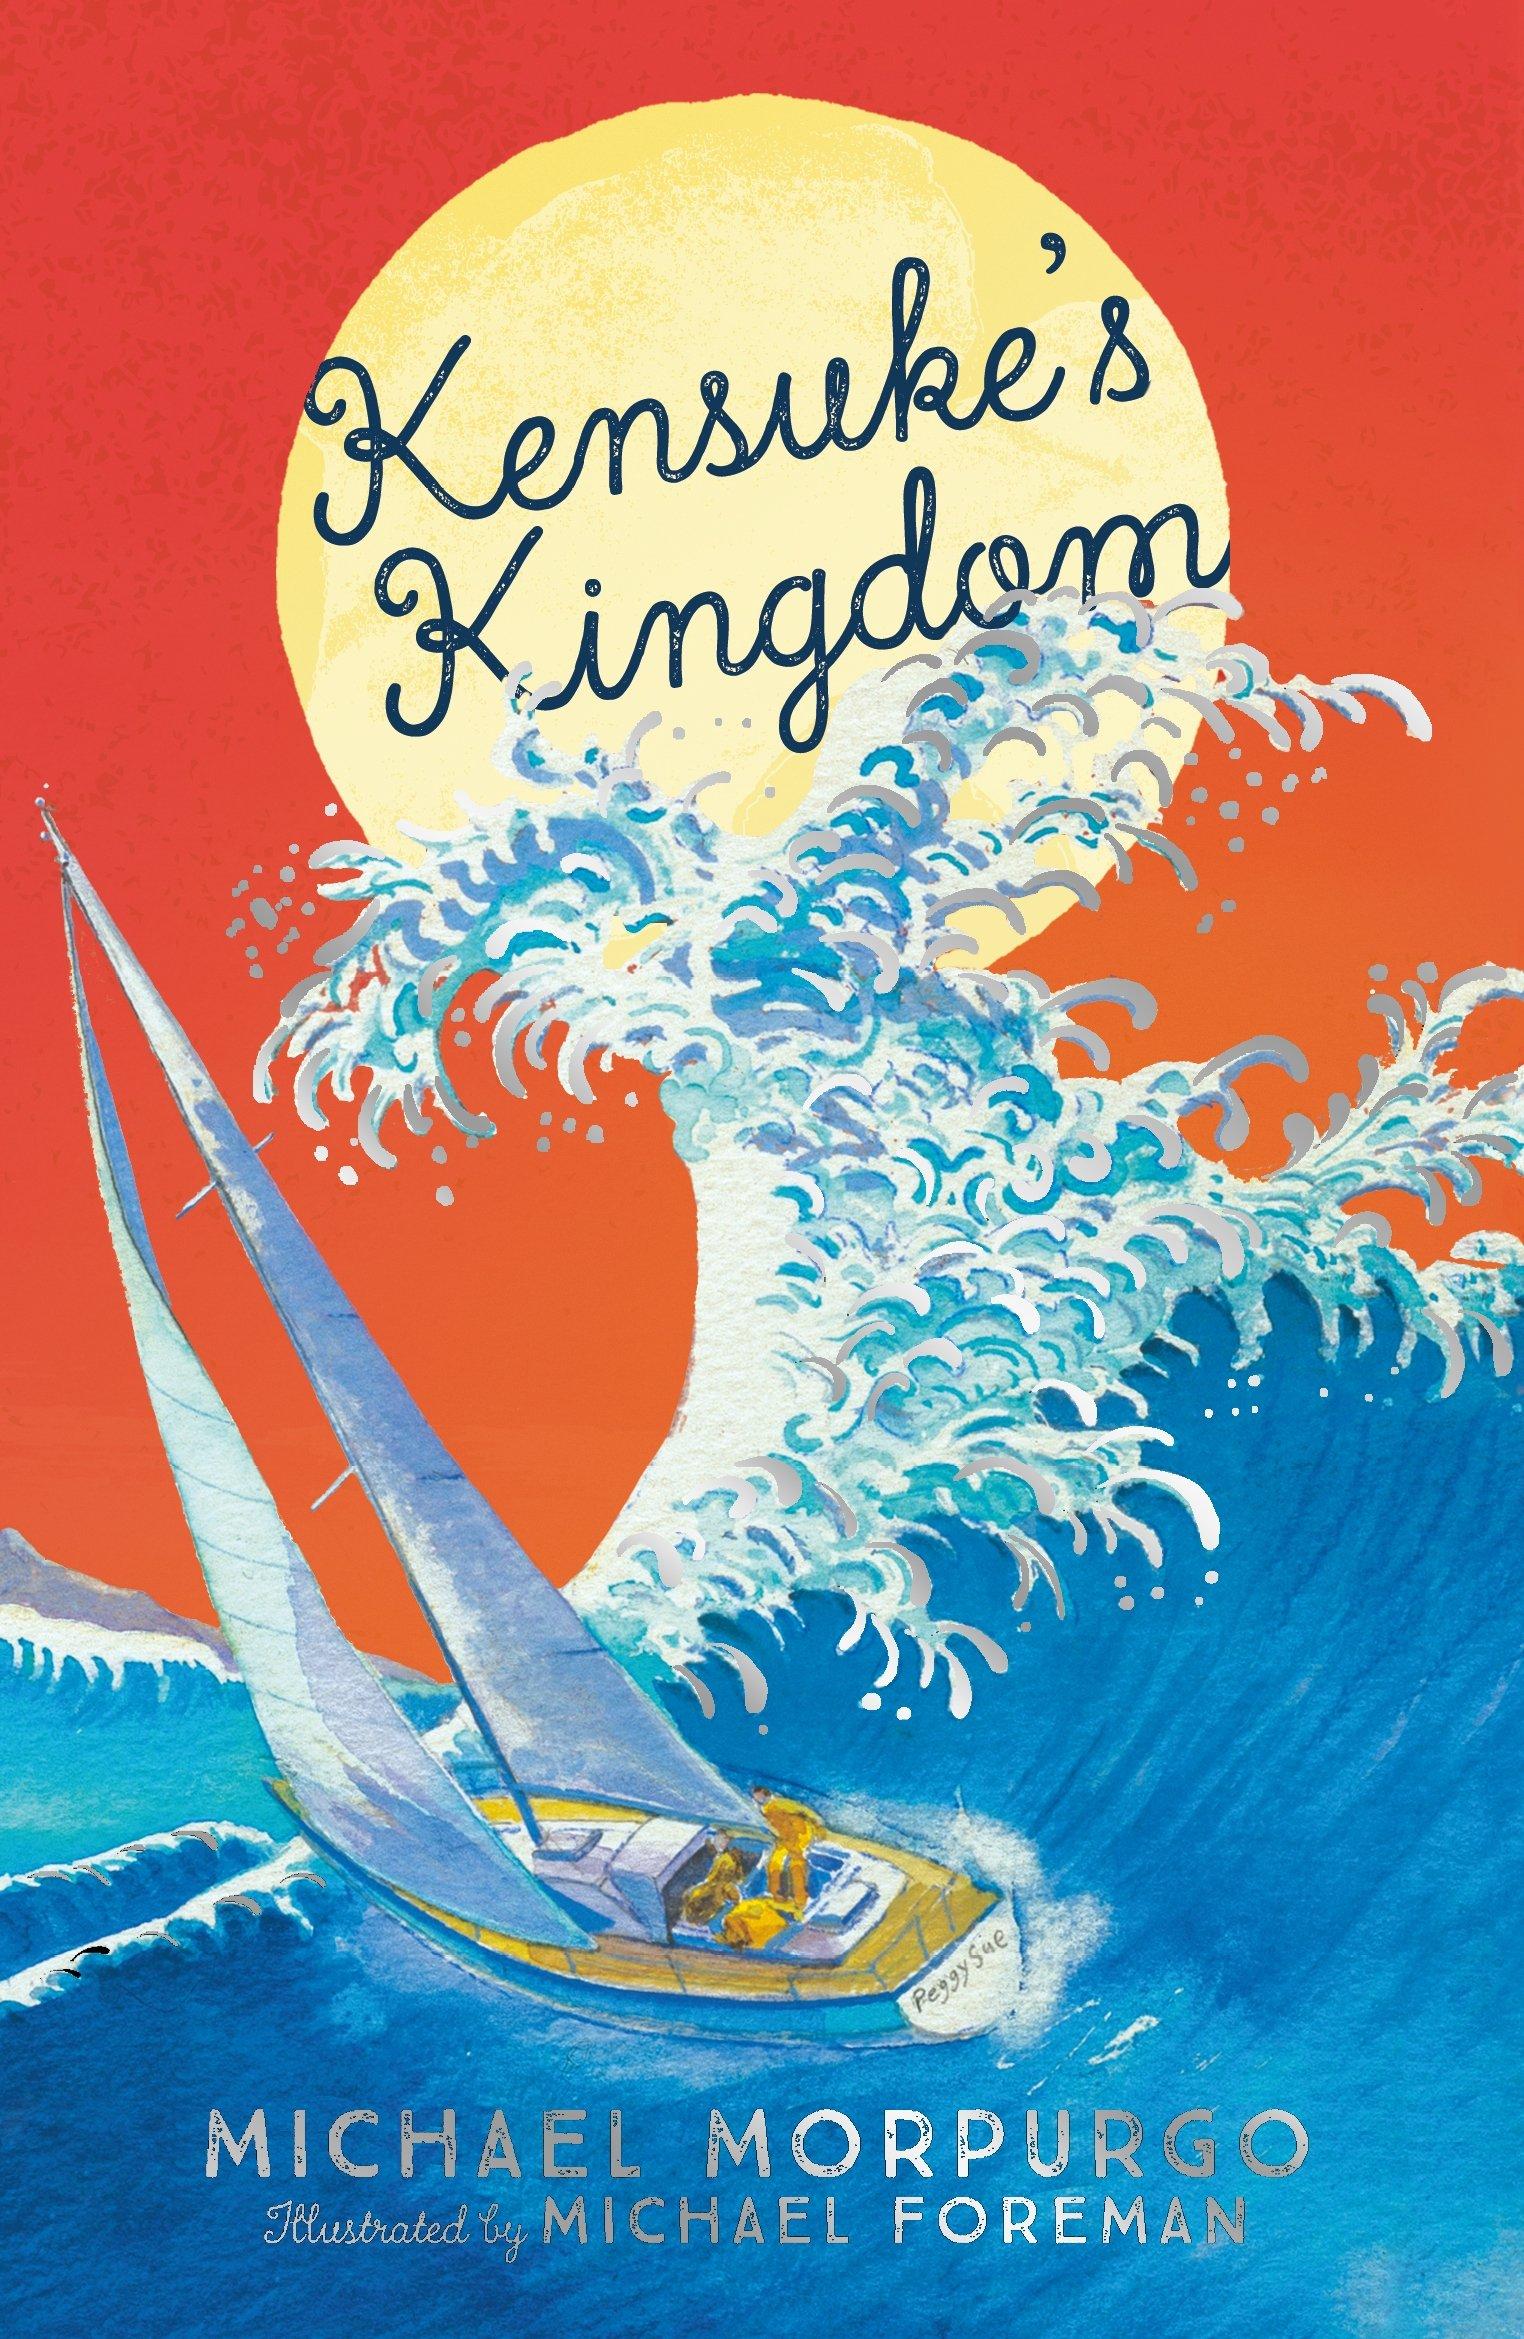 Kensuke's Kingdom (Egmont Modern Classics): Amazon.co.uk: Morpurgo,  Michael: Books